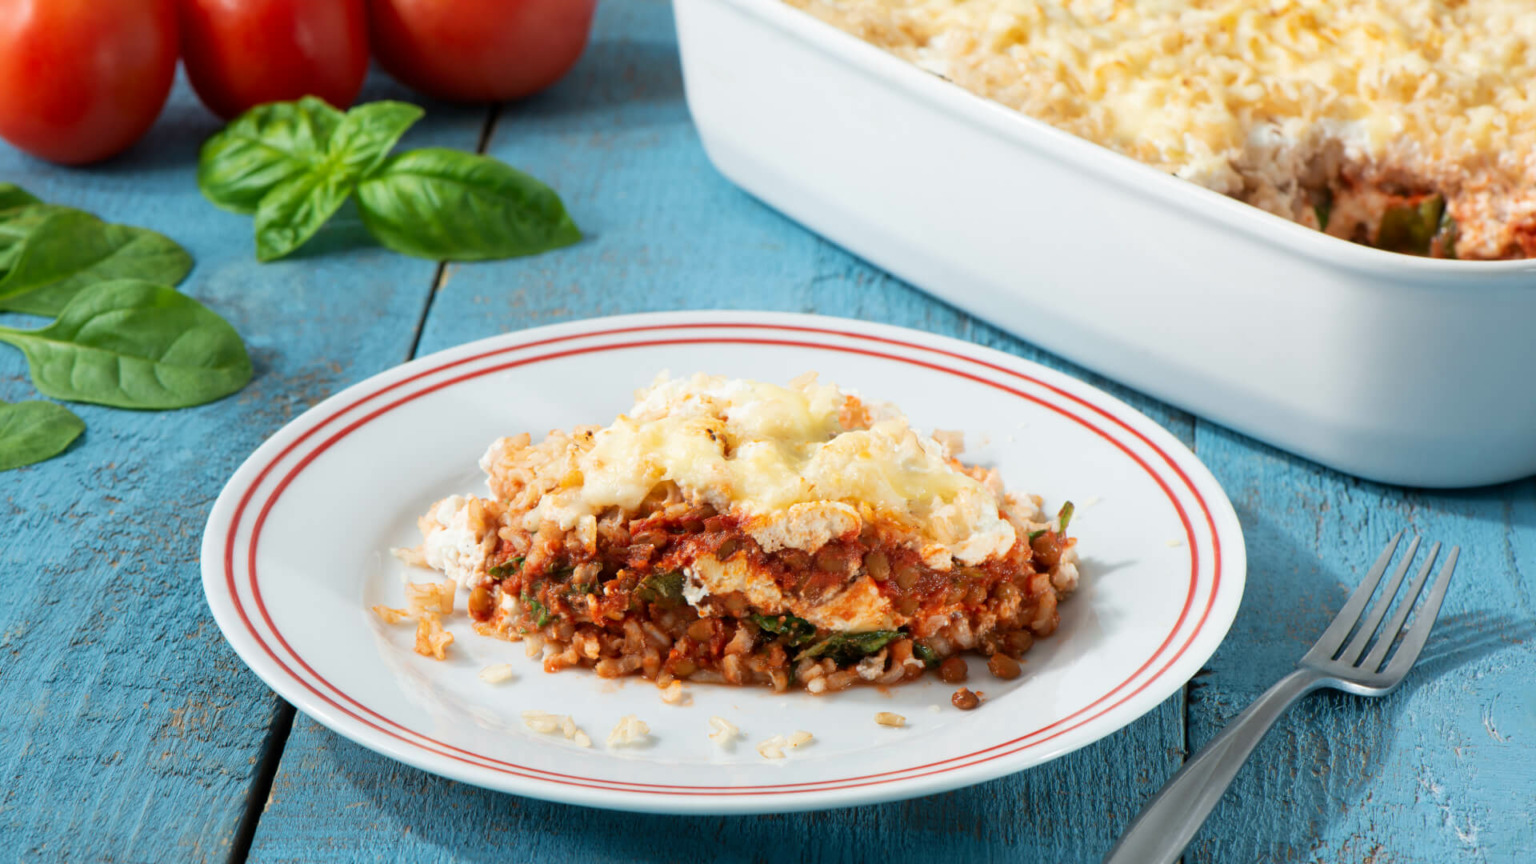 Brown Rice & Lentil Lasagna Casserole